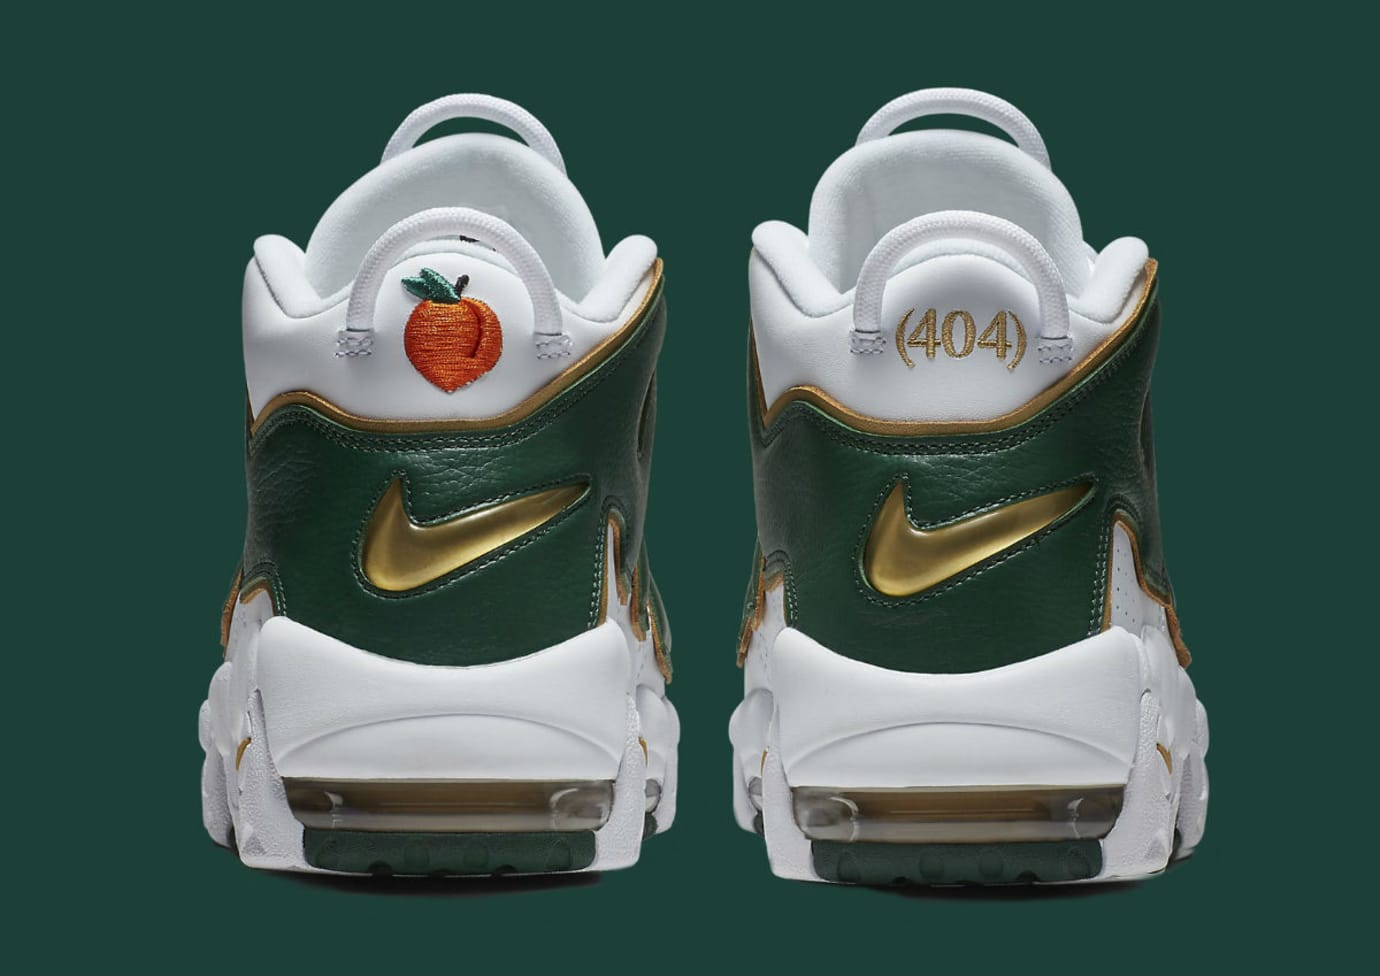 Nike Air More Uptempo Atlanta Release Date AJ3139-100 Heel